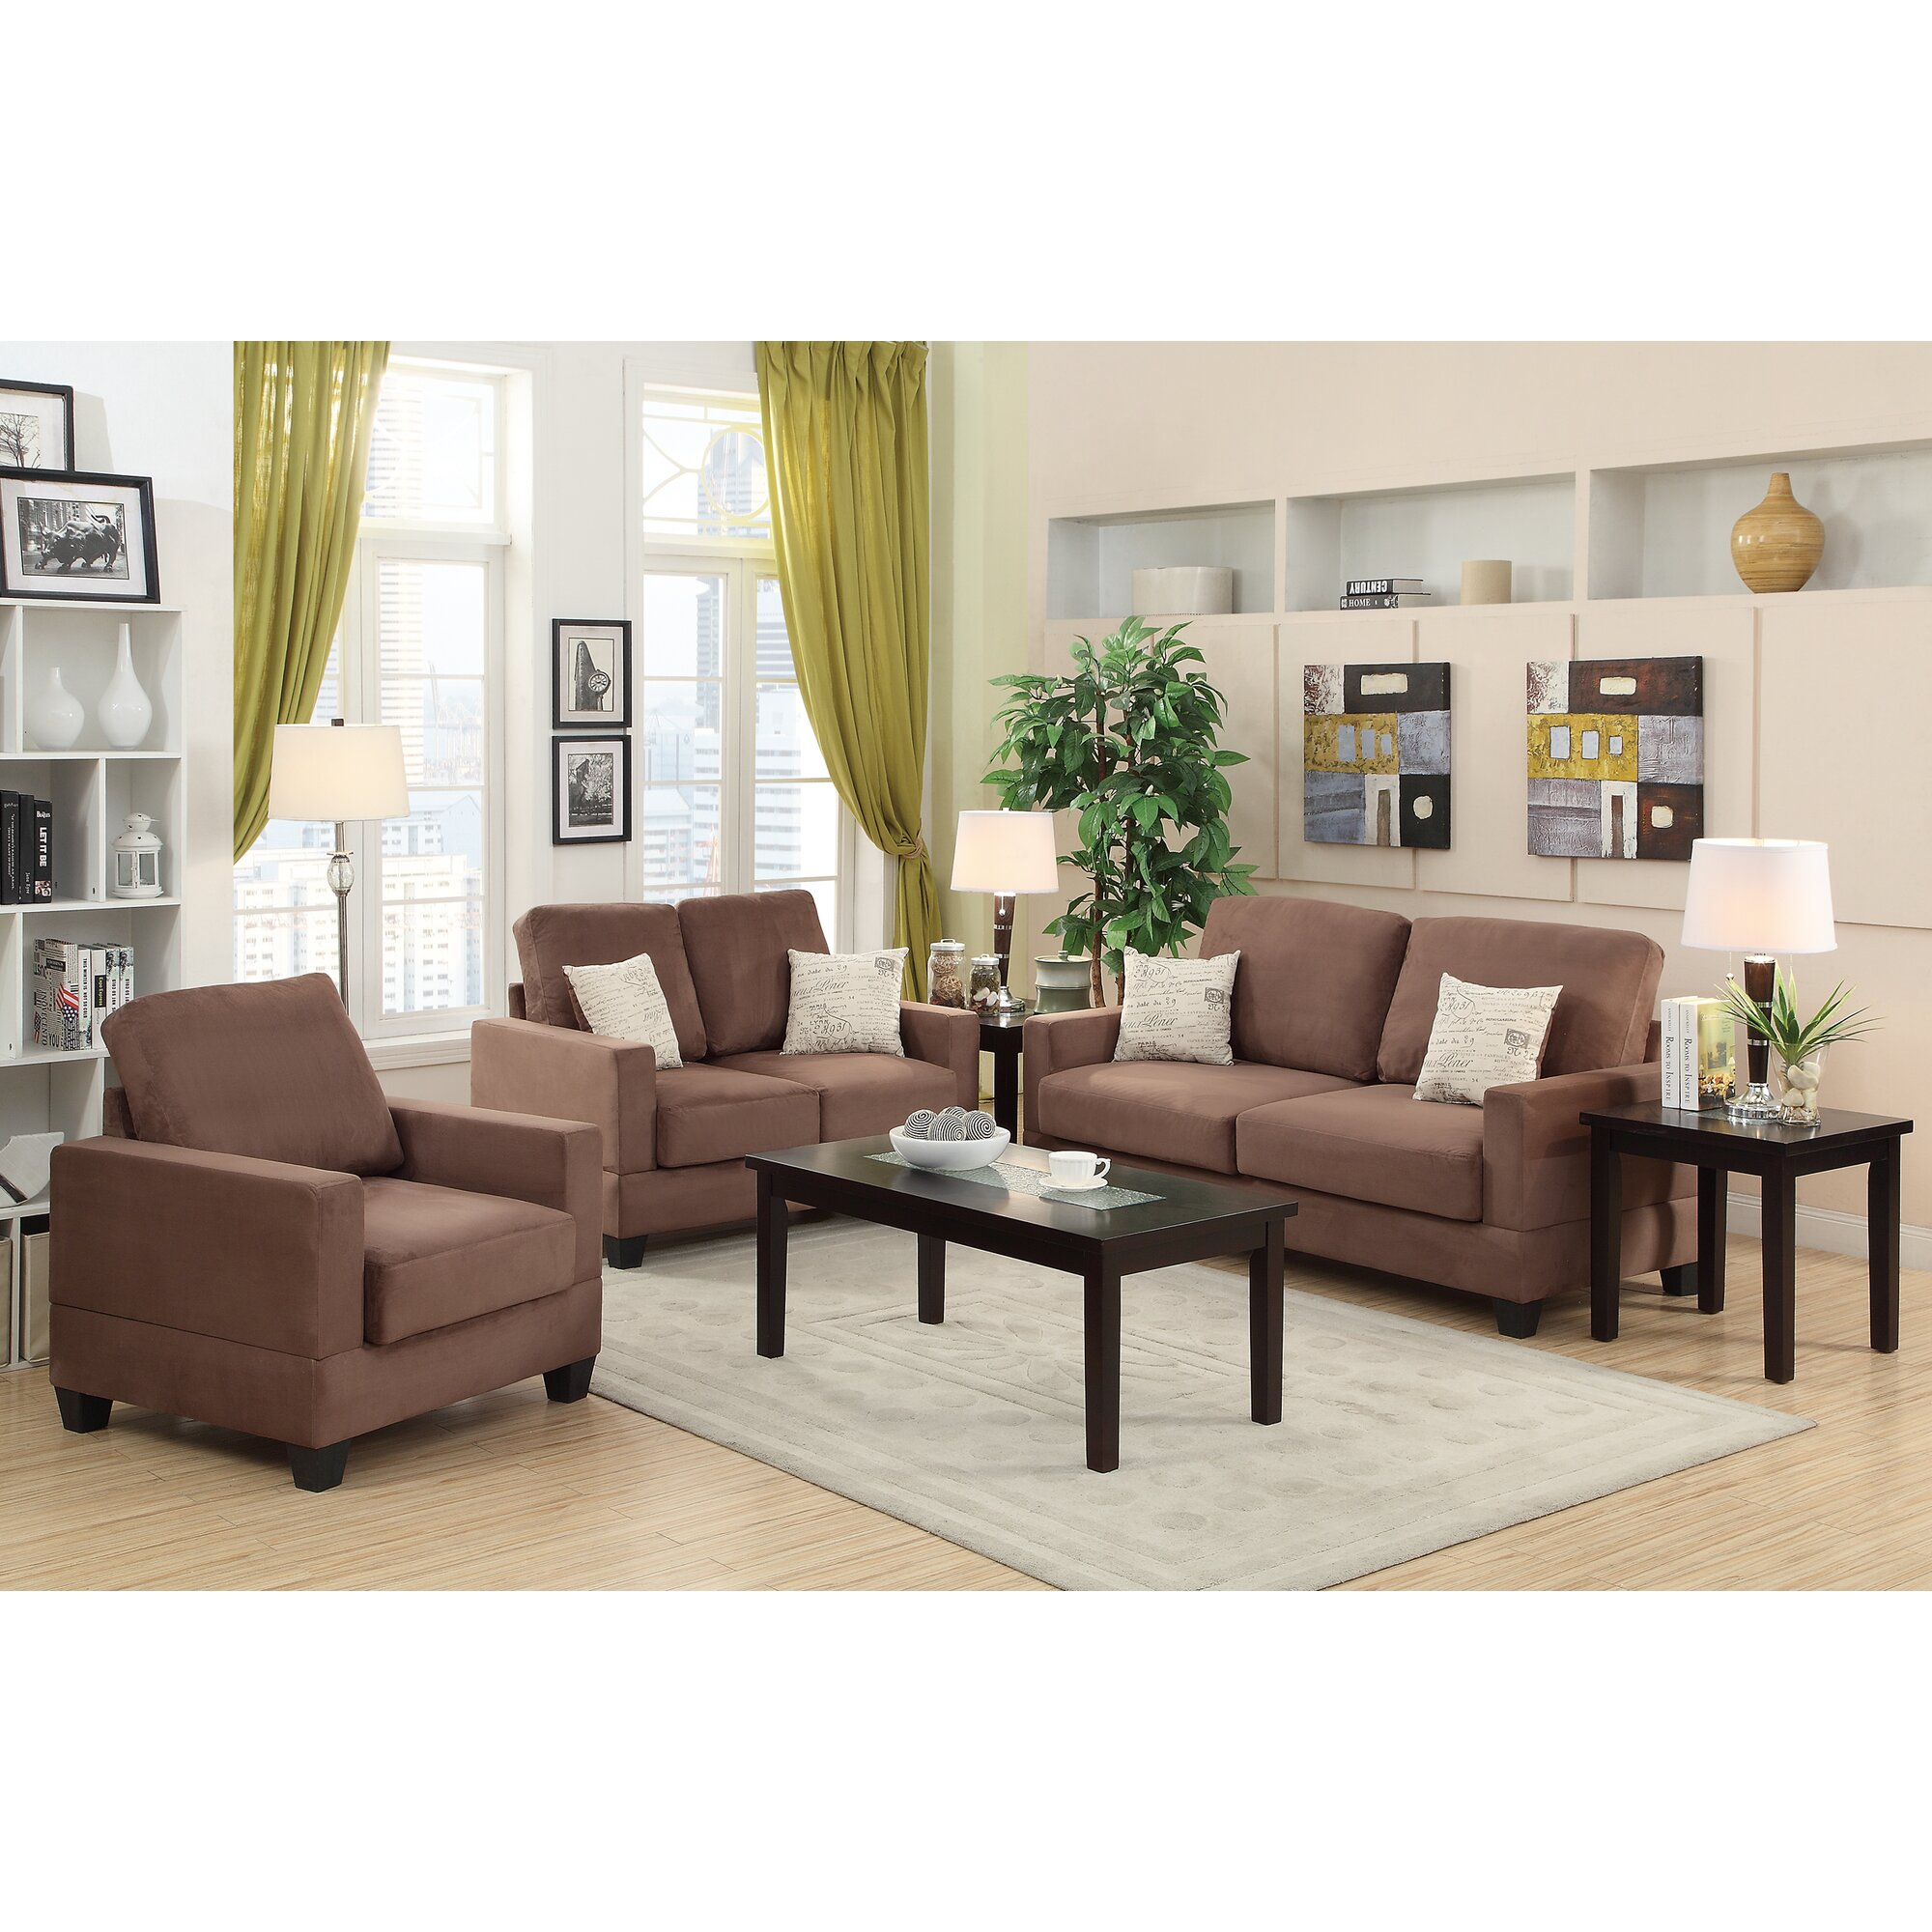 Andover Mills Vanderbilt 3 Piece Sofa And Loveseat With